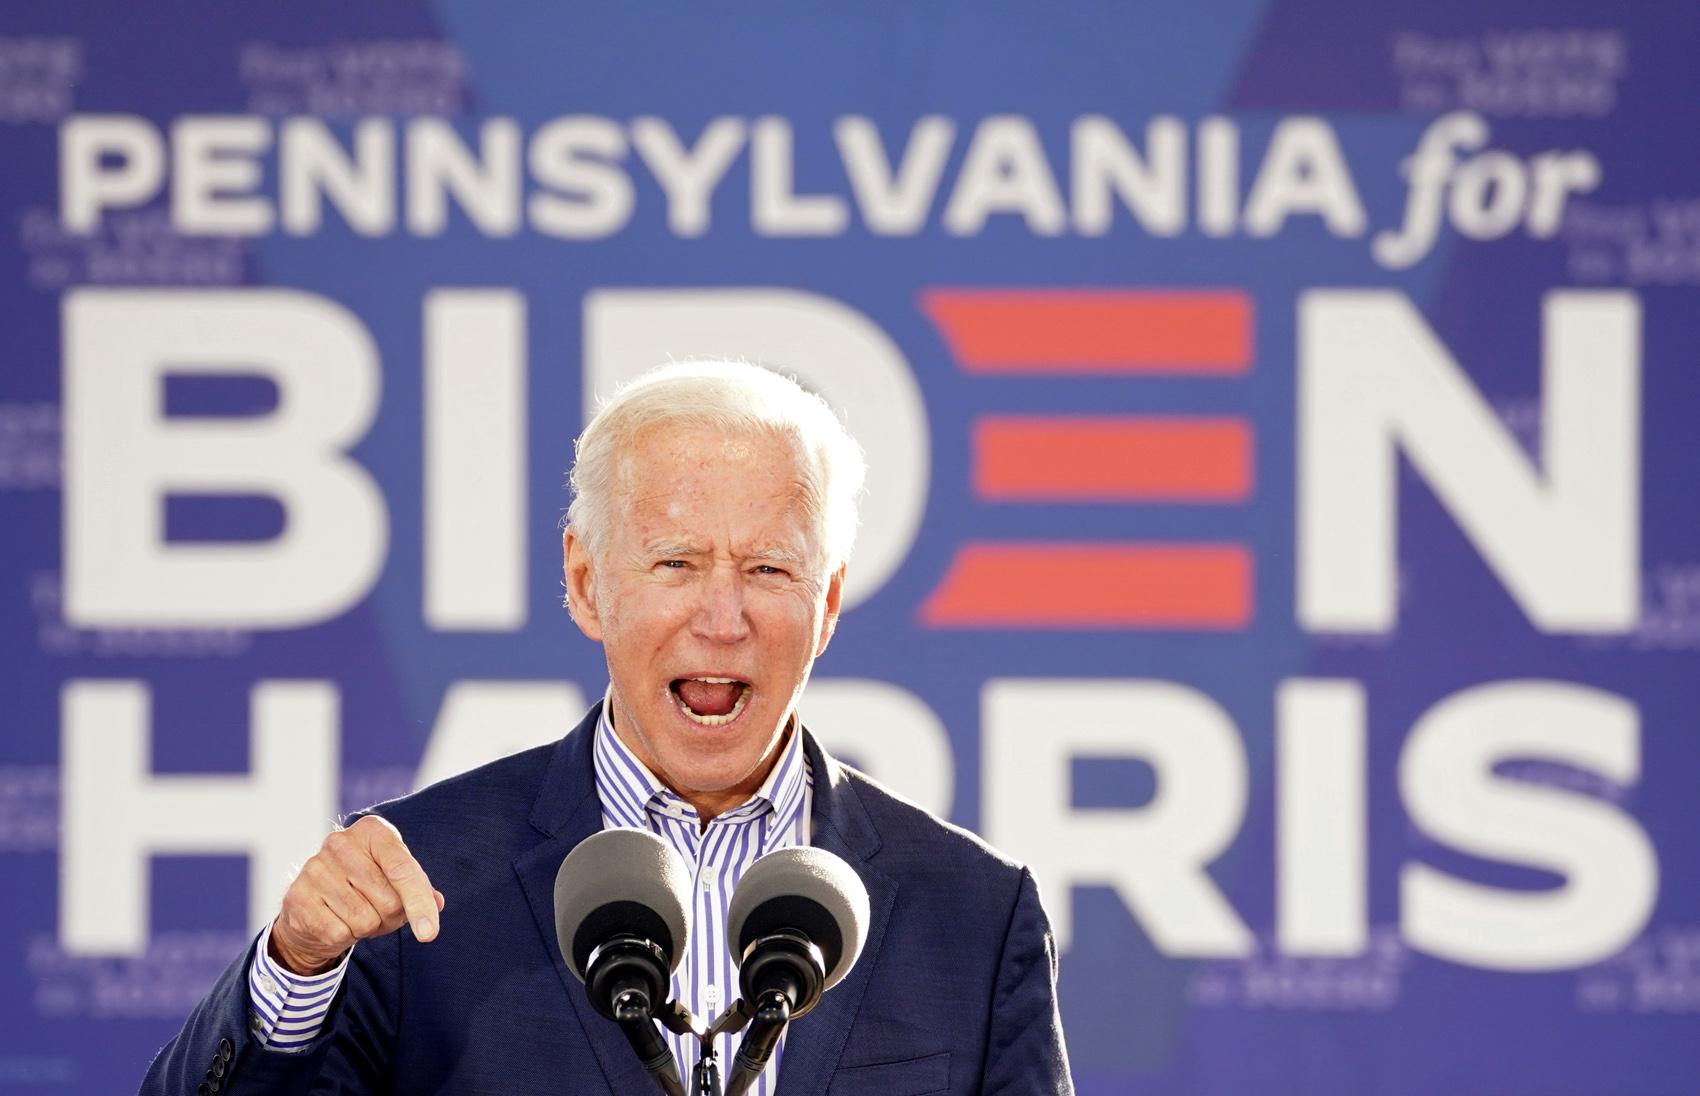 Will Donald Trump or Joe Biden Win? This Website Lets You Decide.